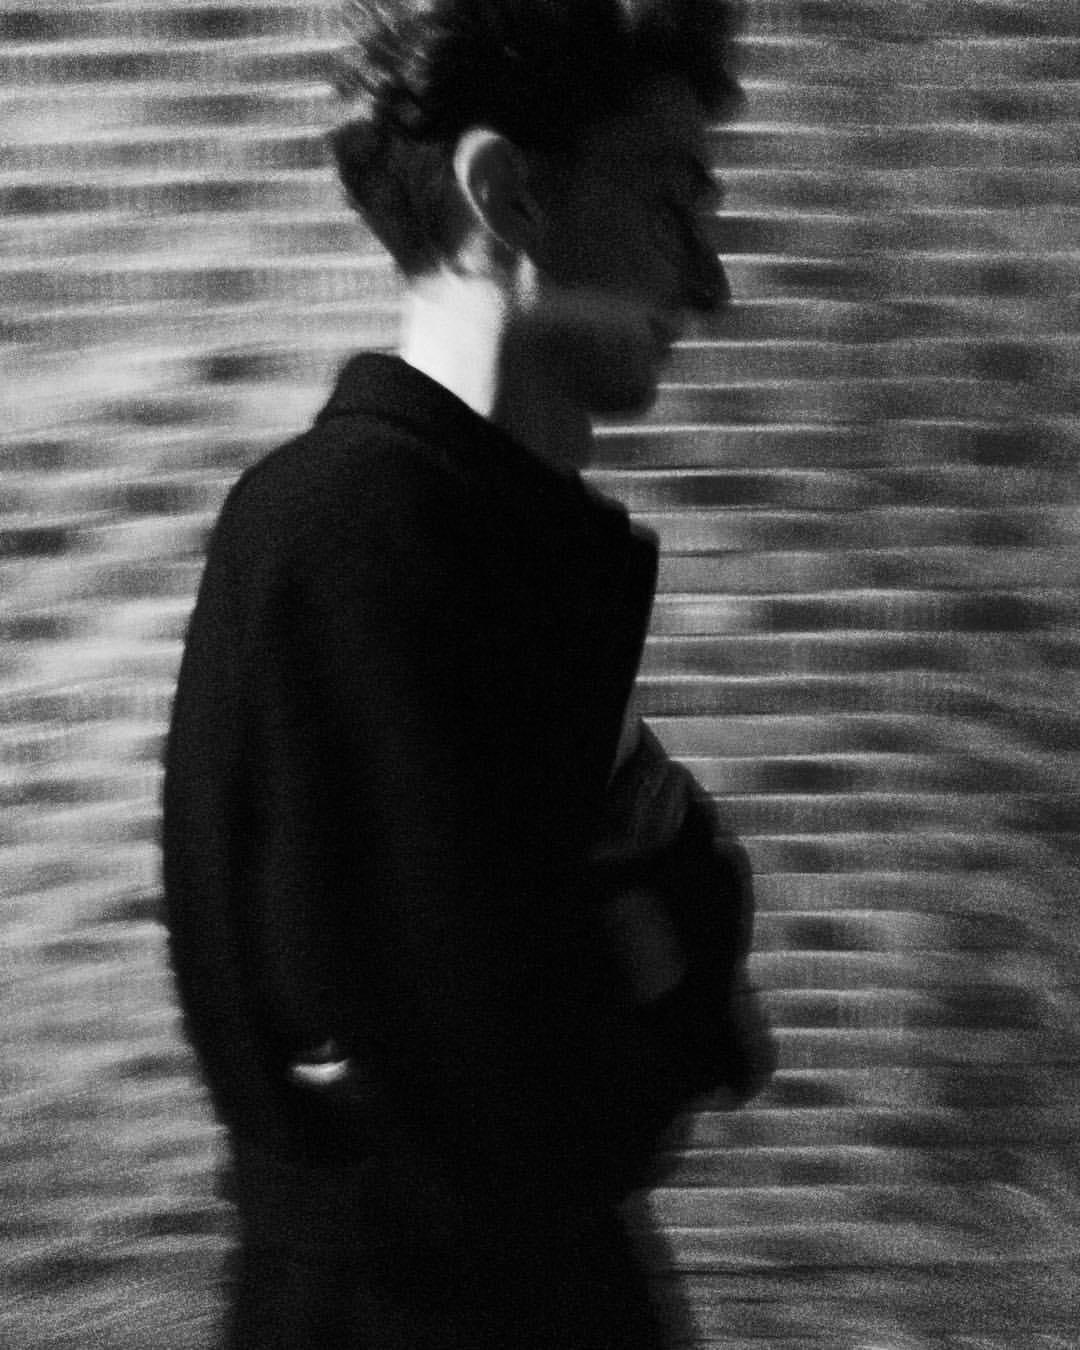 Bonfire night with Harry, London. 2016